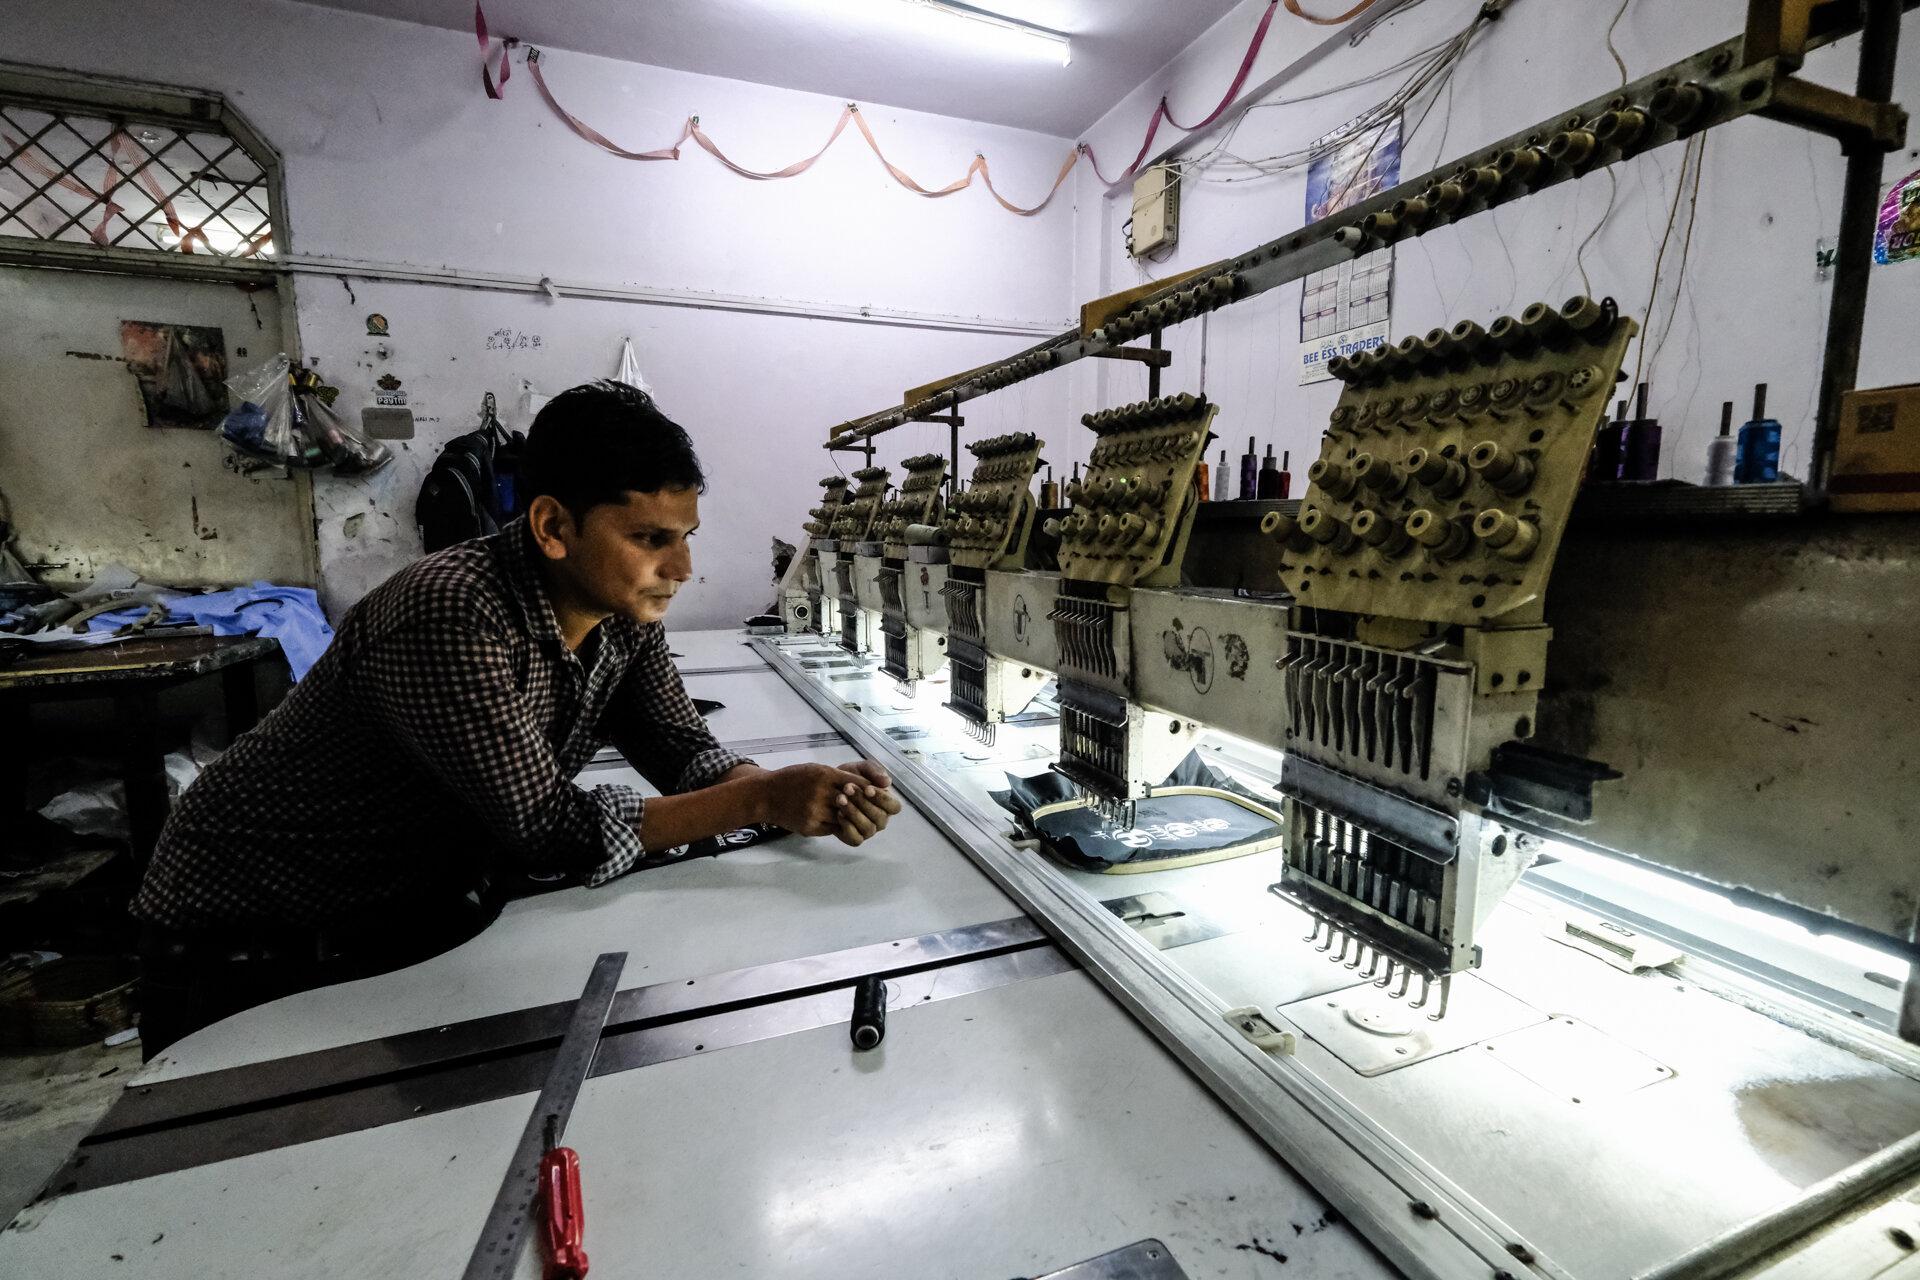 Machine Embroidery Room